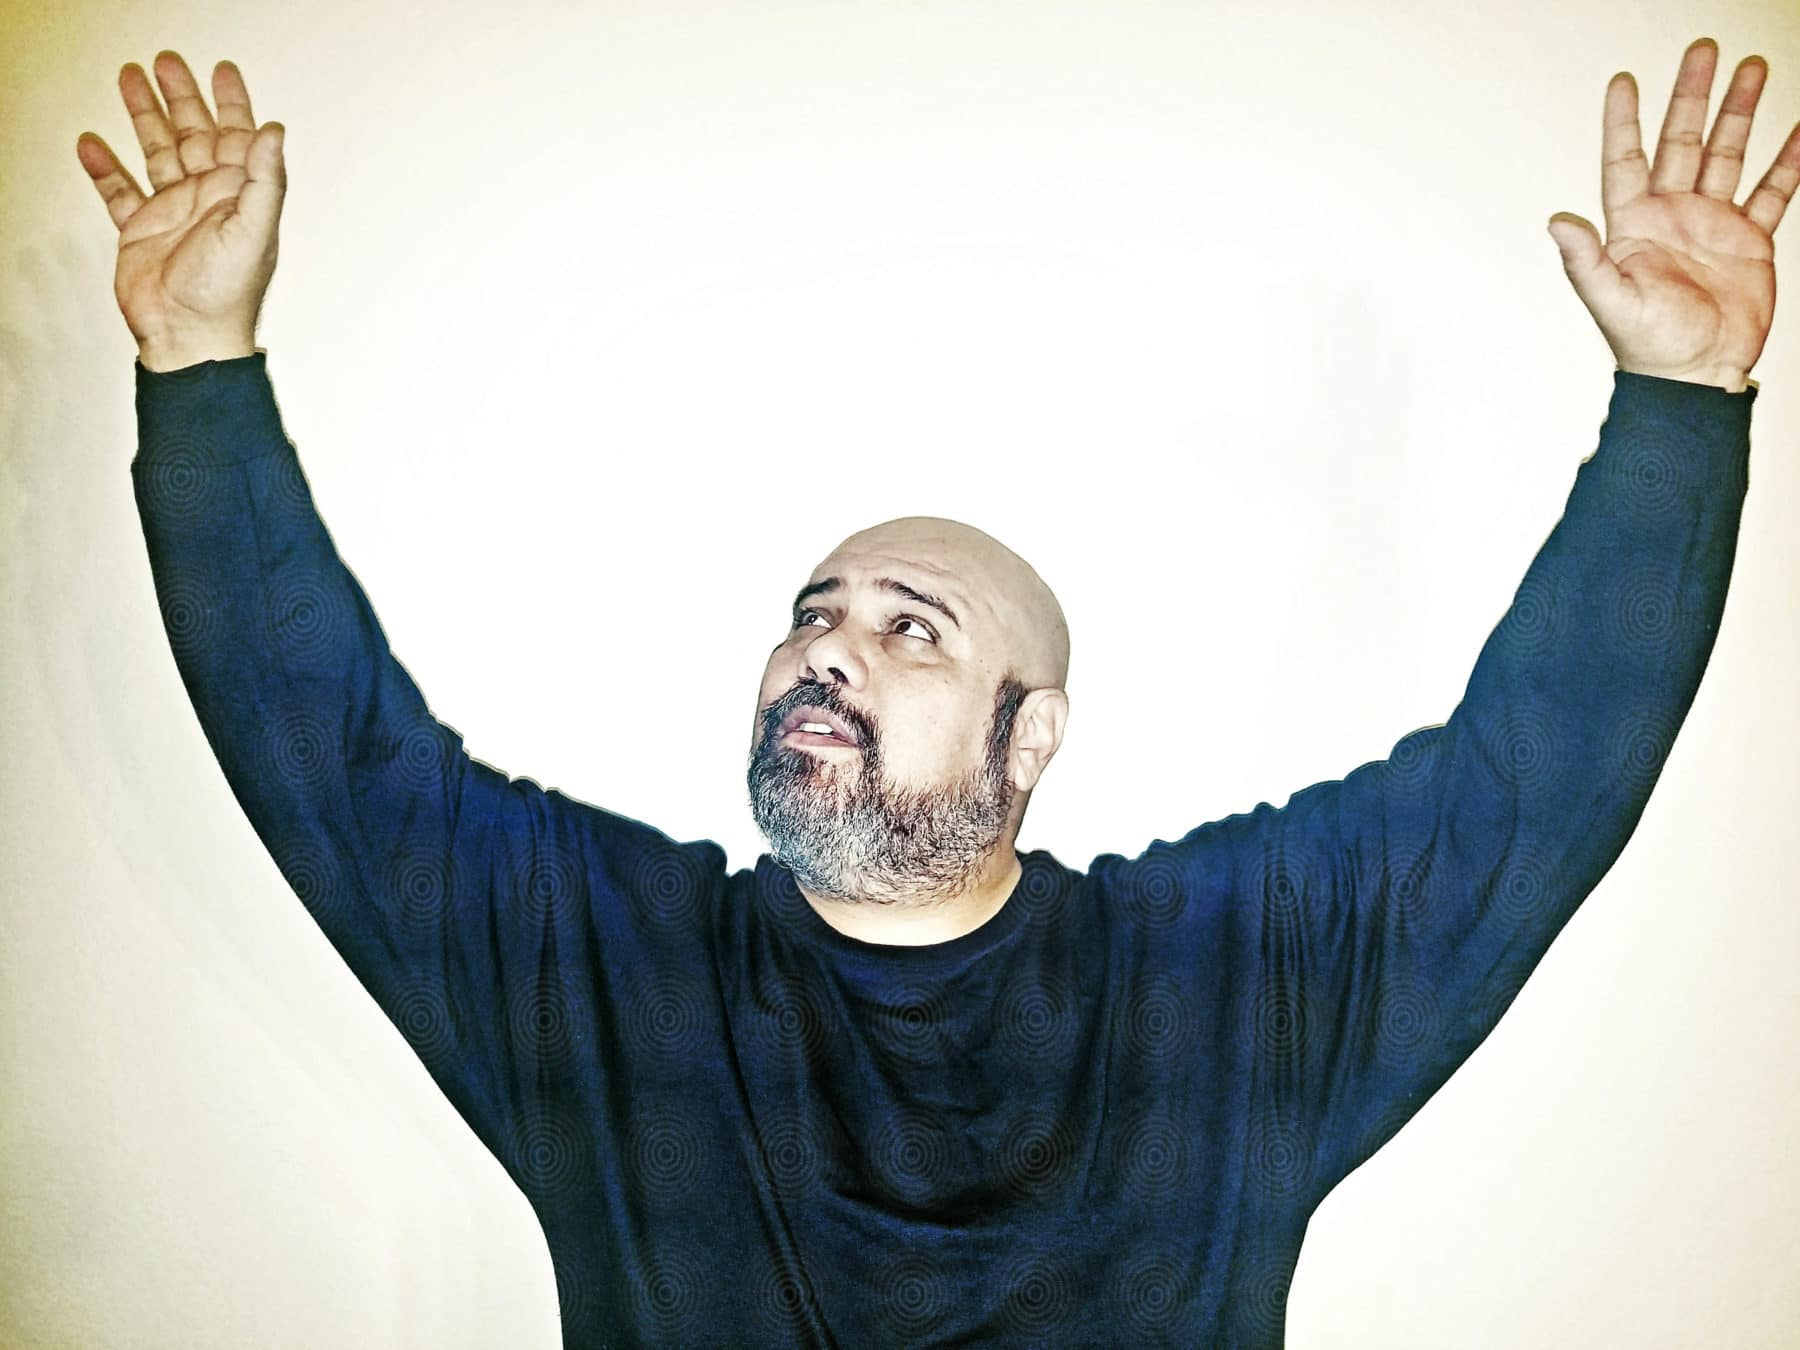 James-Martinez - Author, Artist